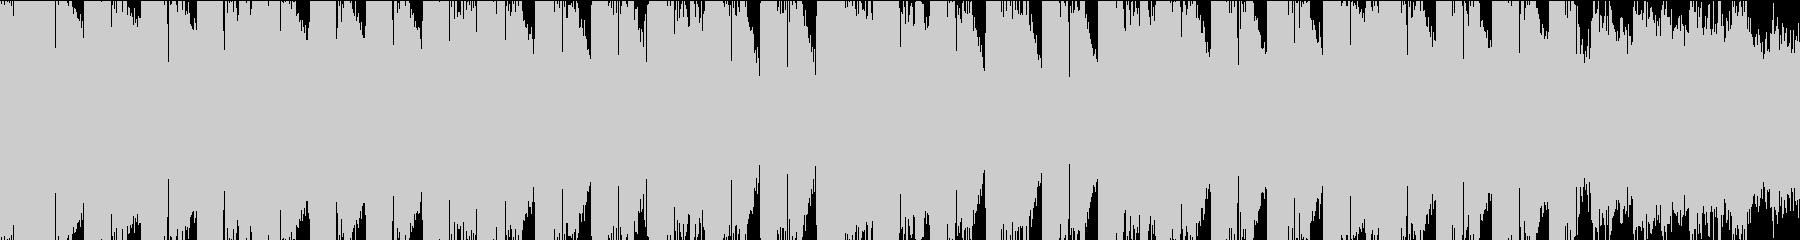 K-Popクラブ系ハードなEDMループLの未再生の波形